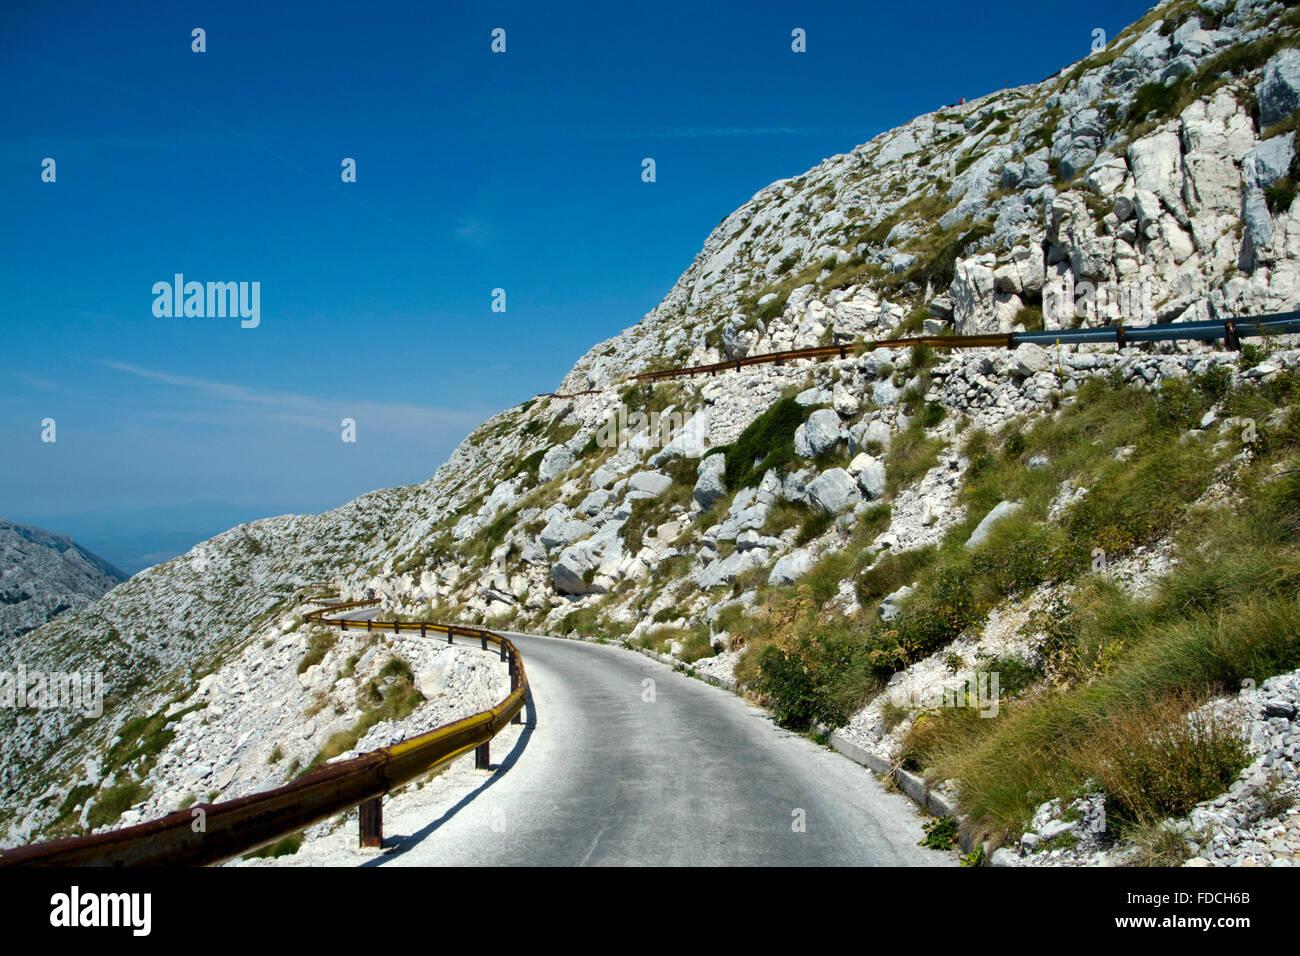 Kroatien, Dalmatien, Makarska, Naturpark Biokovo, Fahrt auf den dritthöchsten Berg Kroatiens, den Sveti Jure - Stock Image